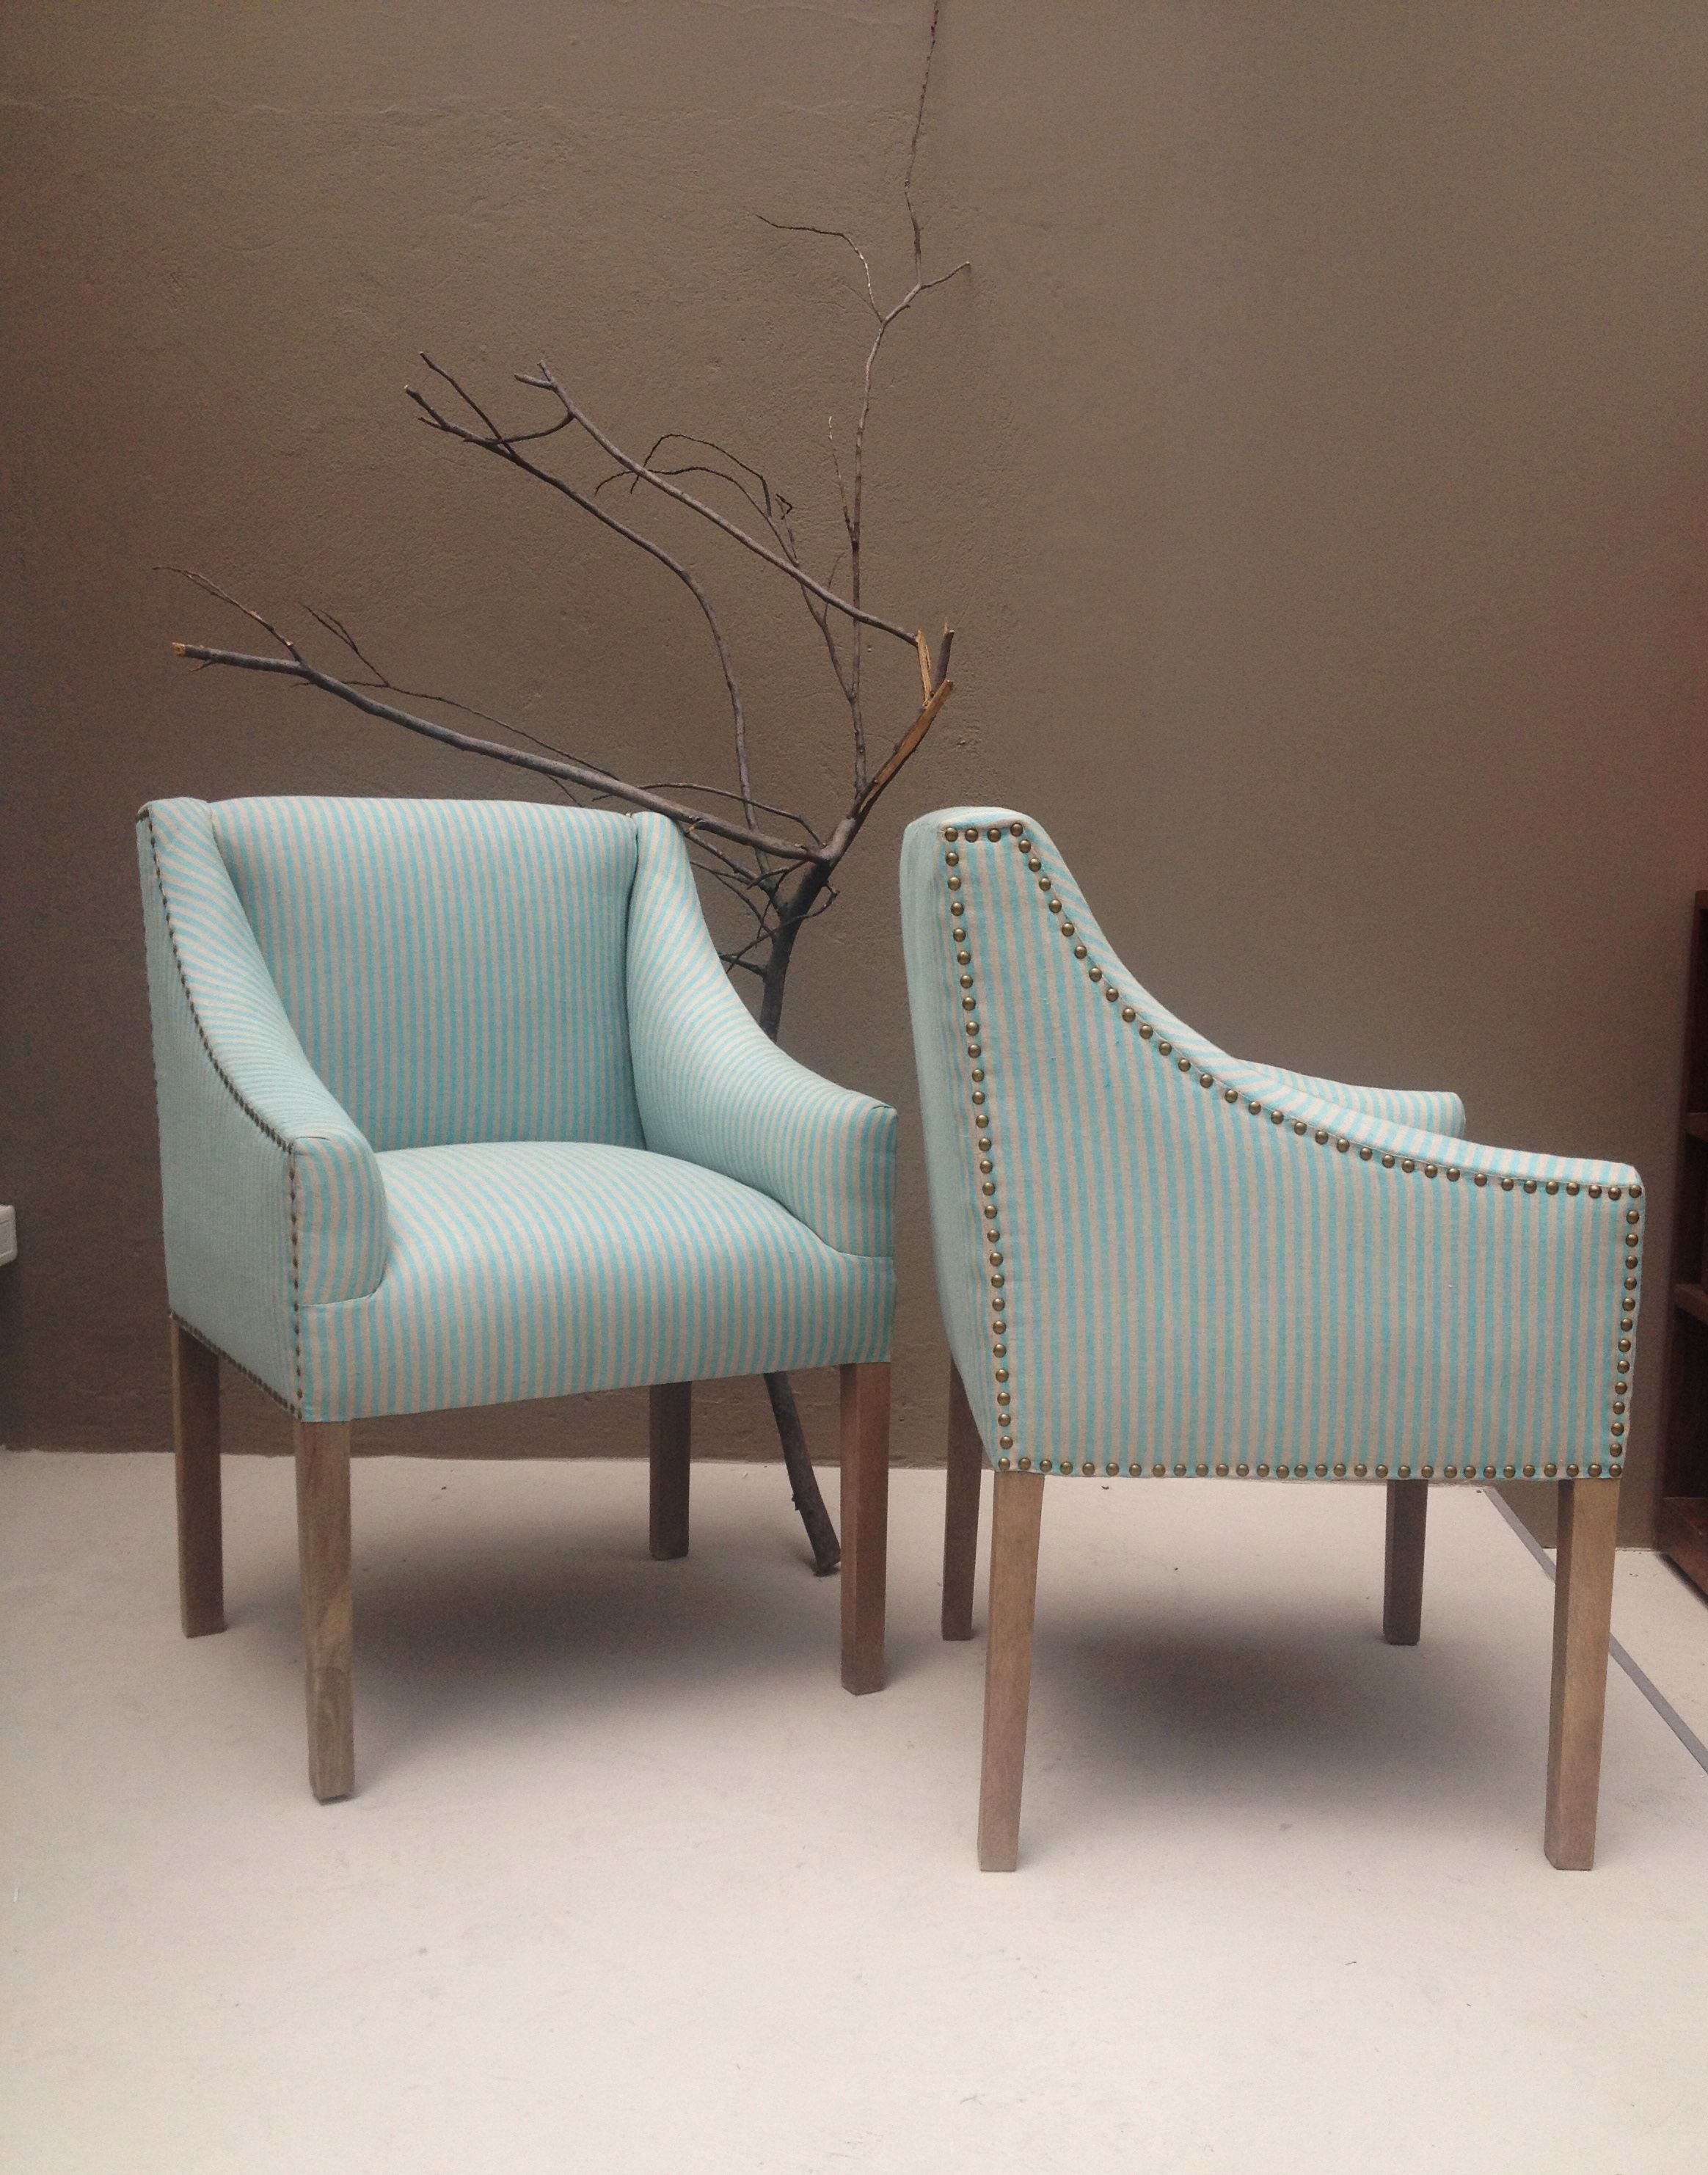 Sillas auxiliares sillas comedor pinterest comedores muebles y sillas - Muebles auxiliares comedor ...